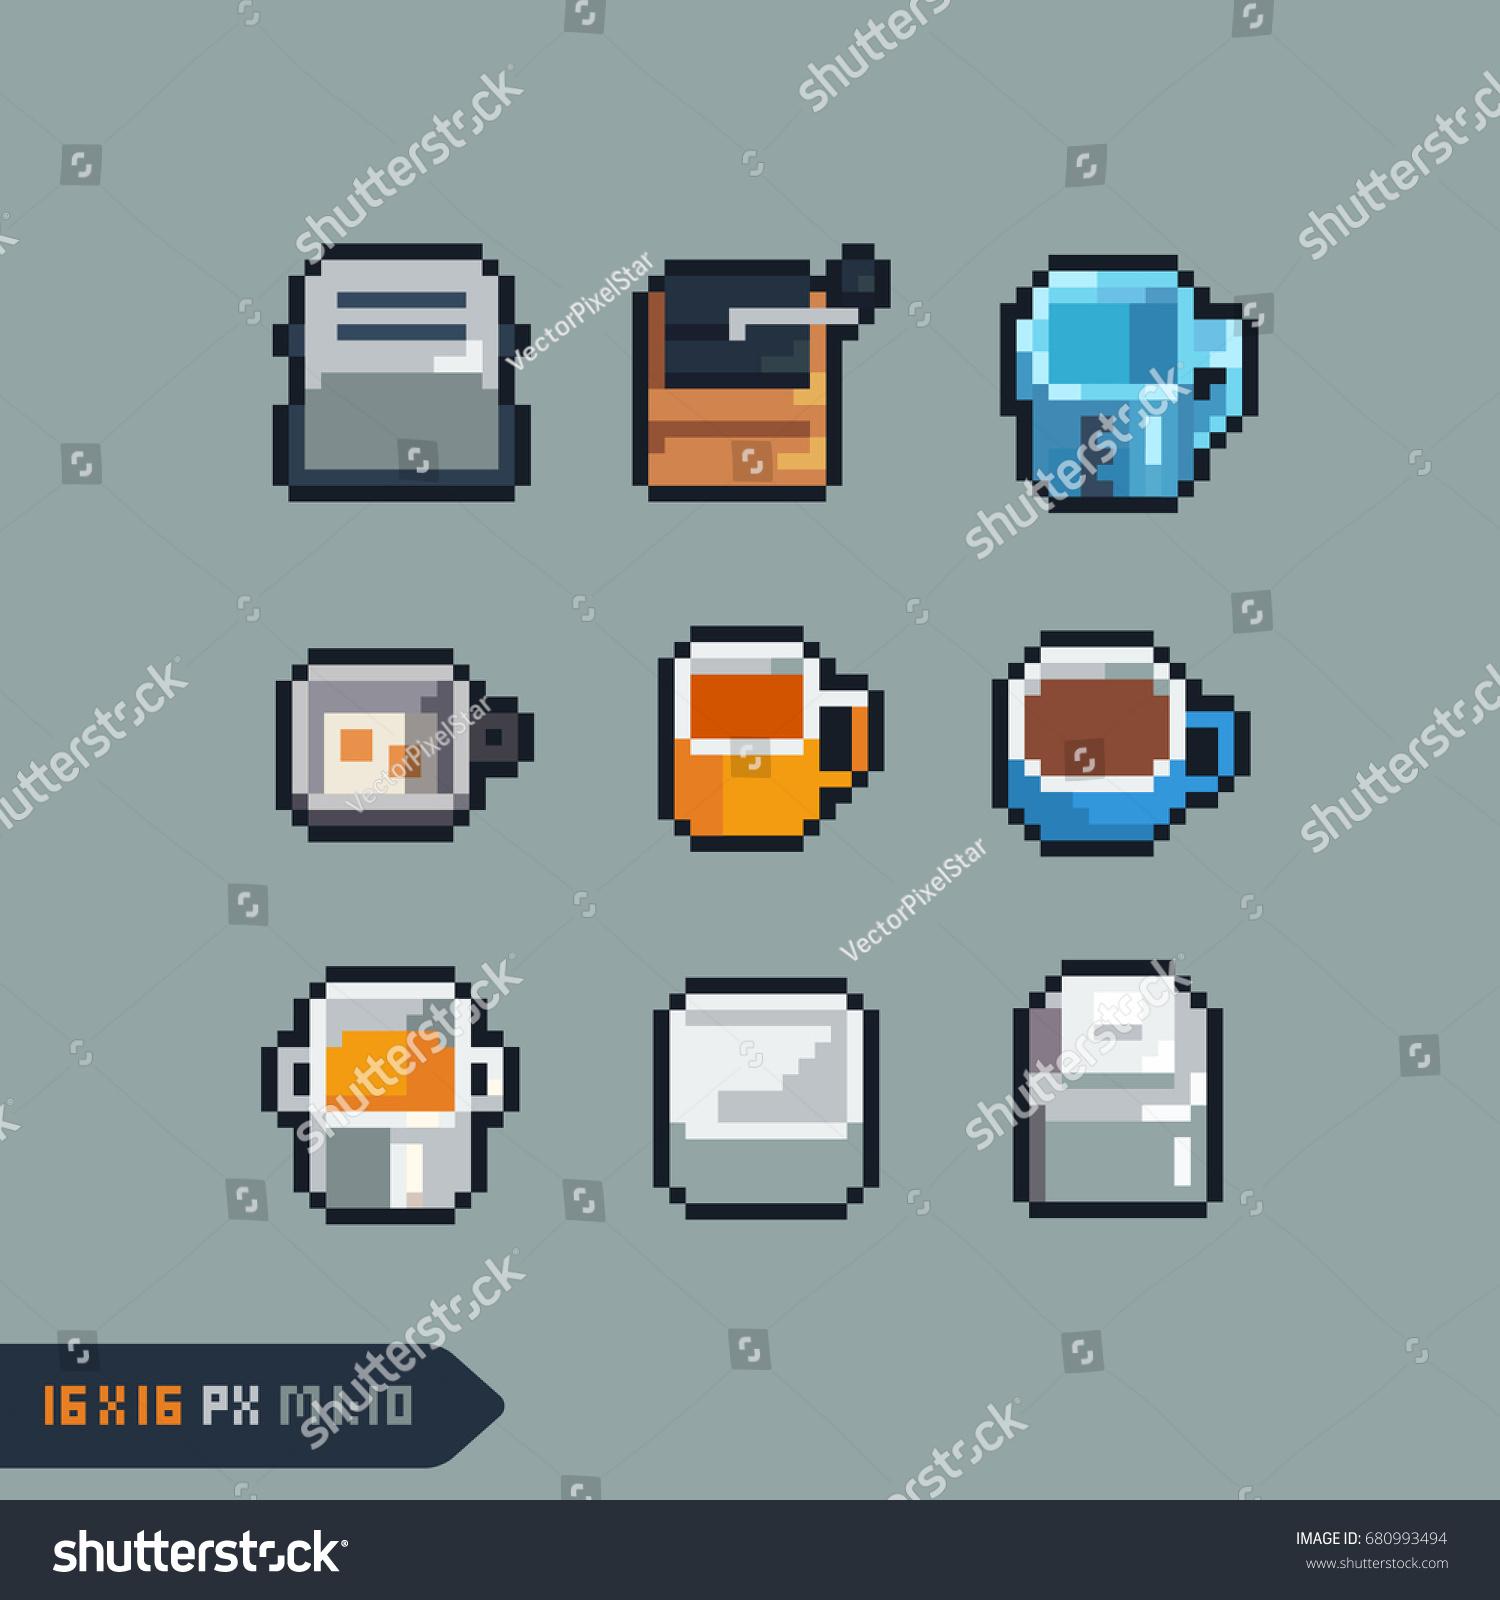 Kitchen Tools Icons Set Pixel Art Stock Vector (Royalty Free ...